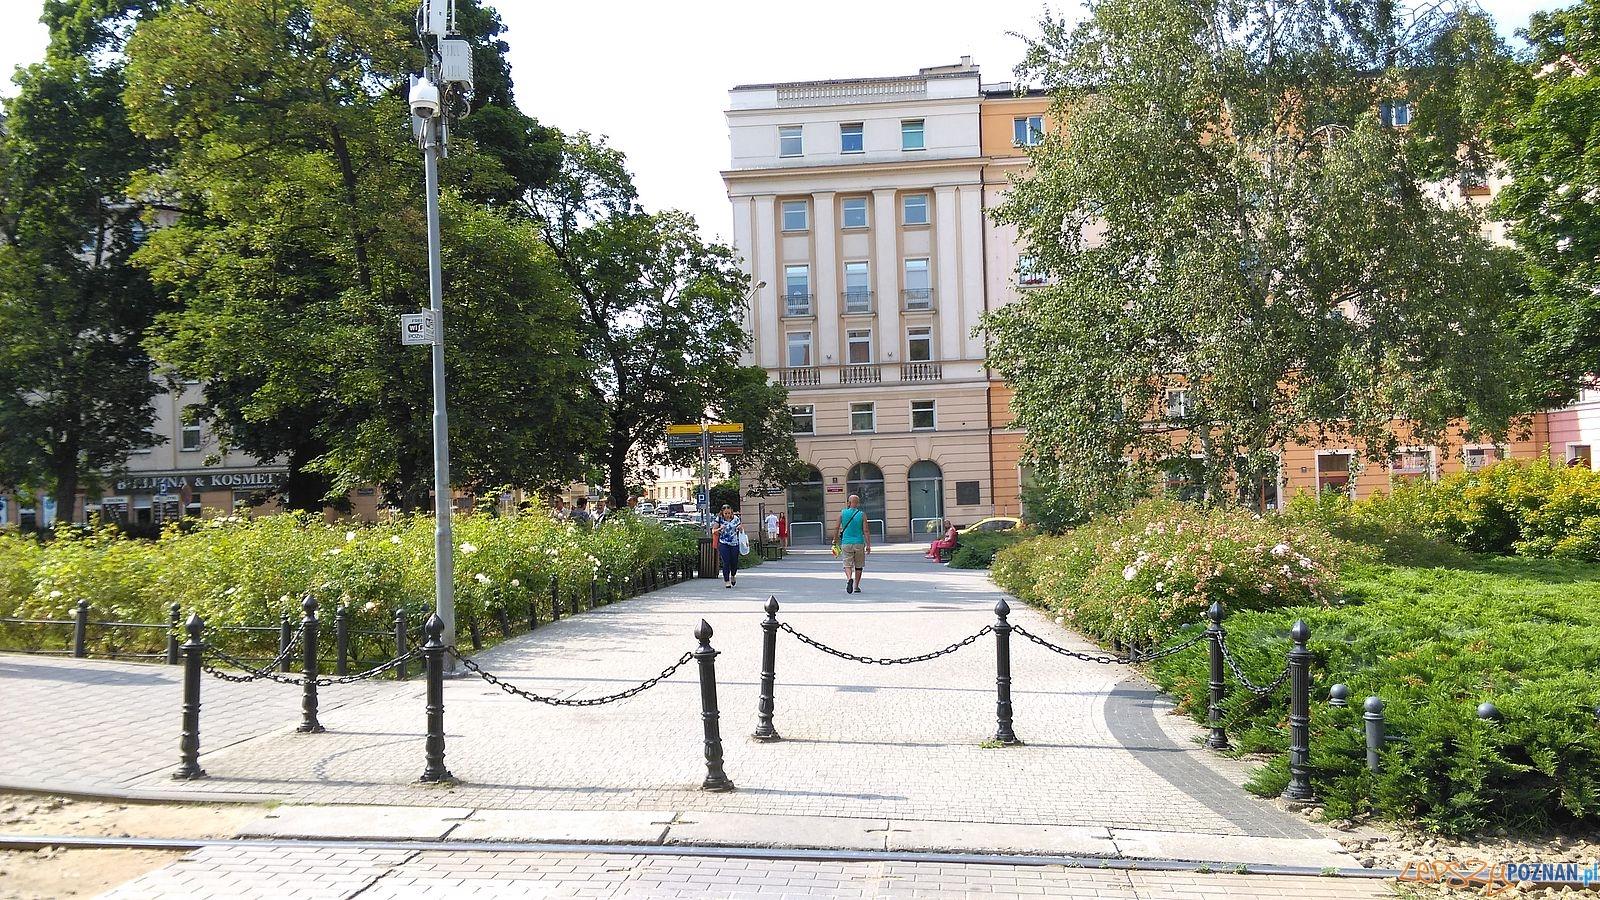 Plac Ratajskiego (7)  Foto: T. Dworek / ROSM